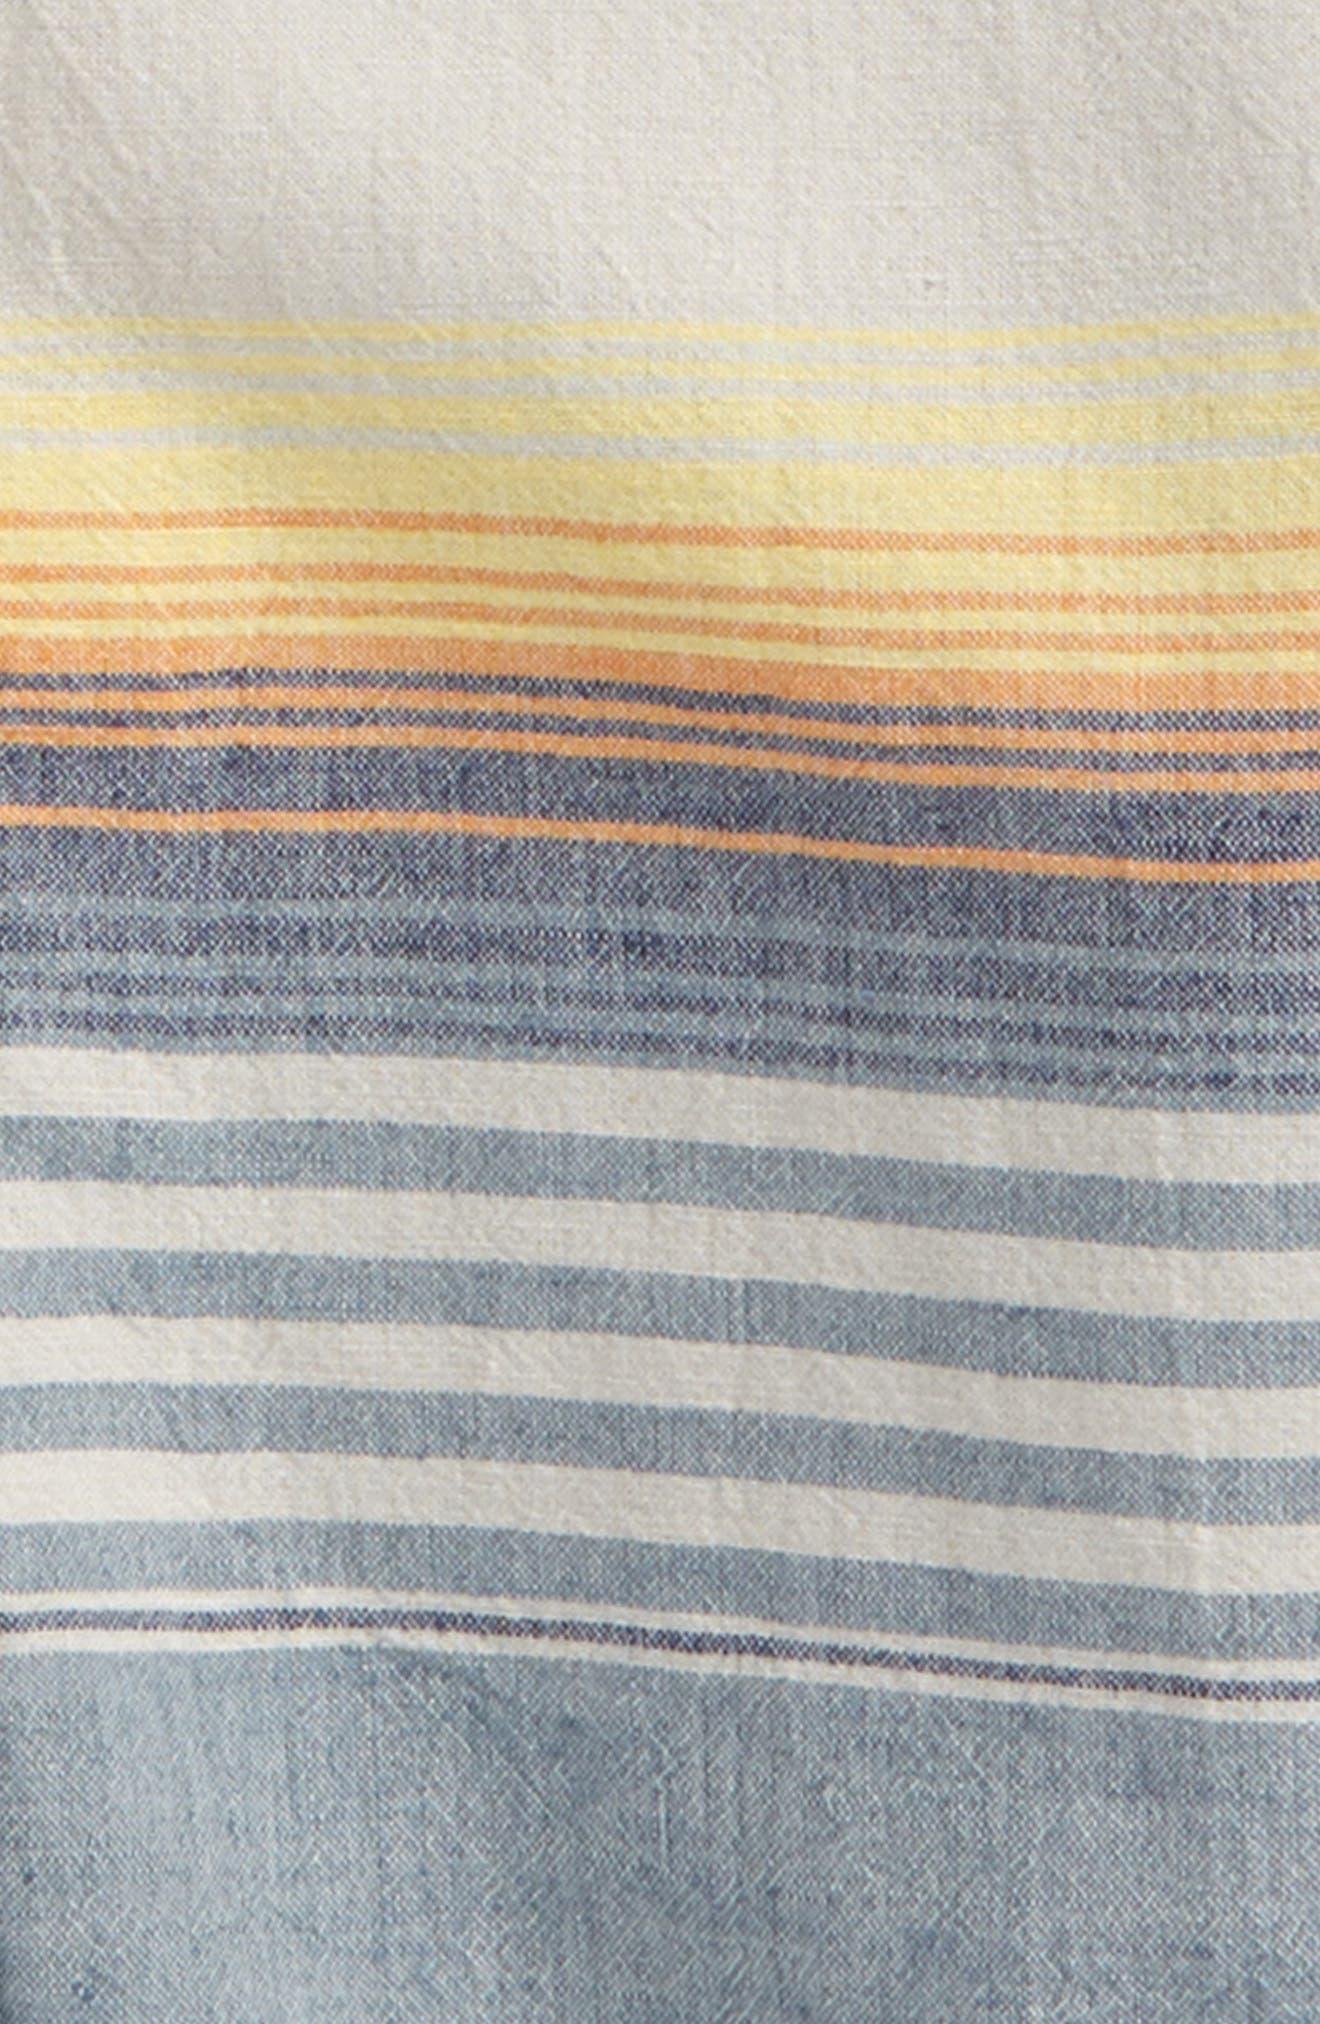 Chambray Stripe Shirt,                             Alternate thumbnail 2, color,                             Blue Chambray Sunset Stripe